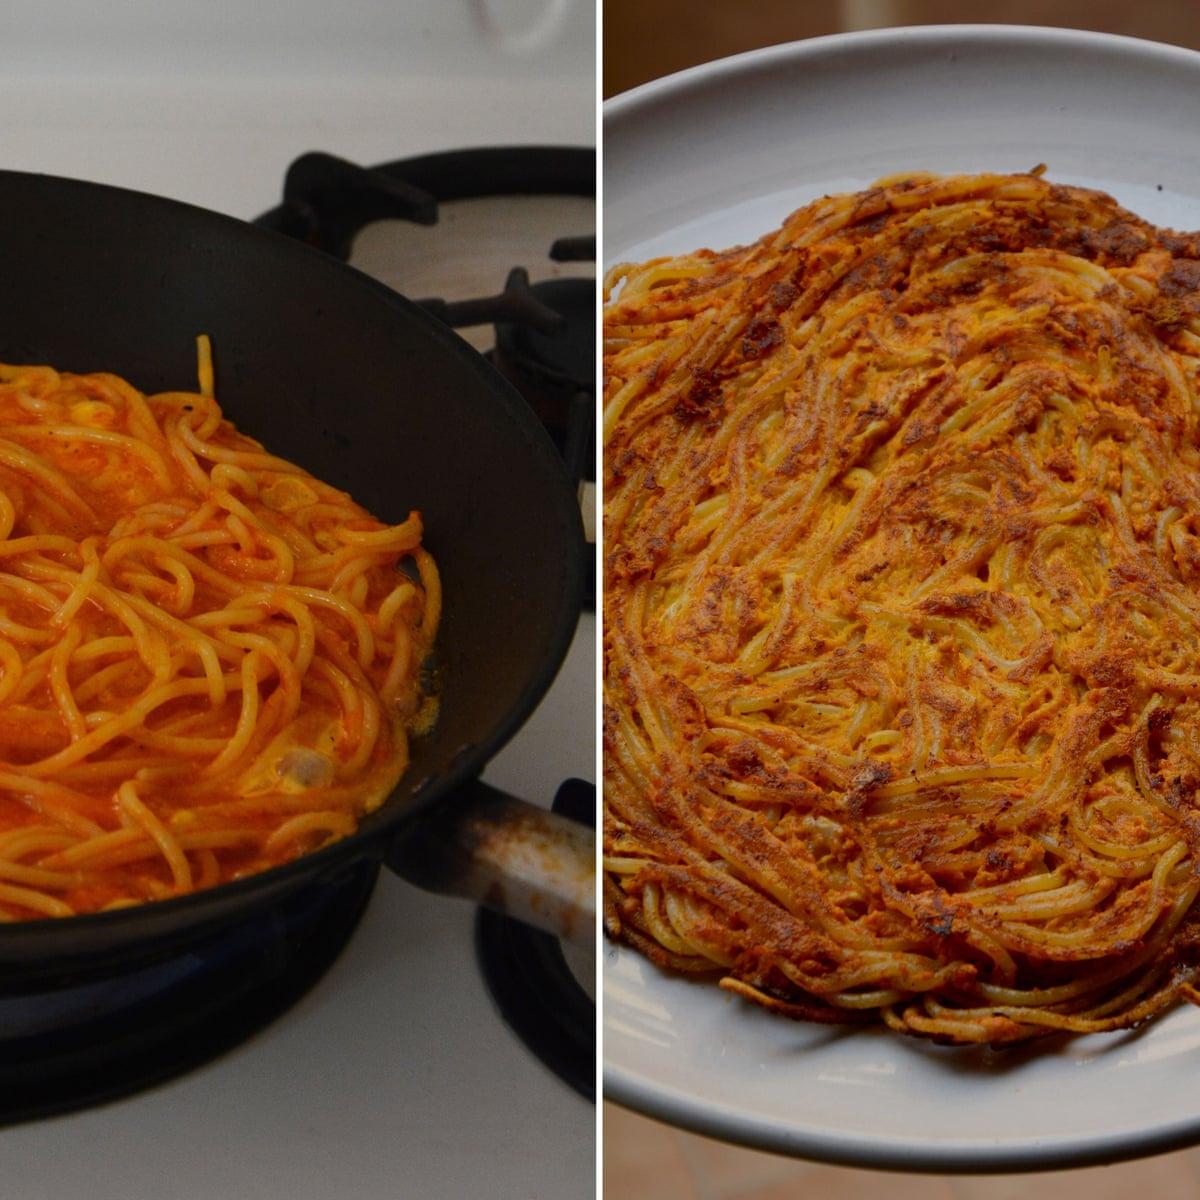 Rachel Roddy S Recipe For Leftover Spaghetti Frittata Food The Guardian